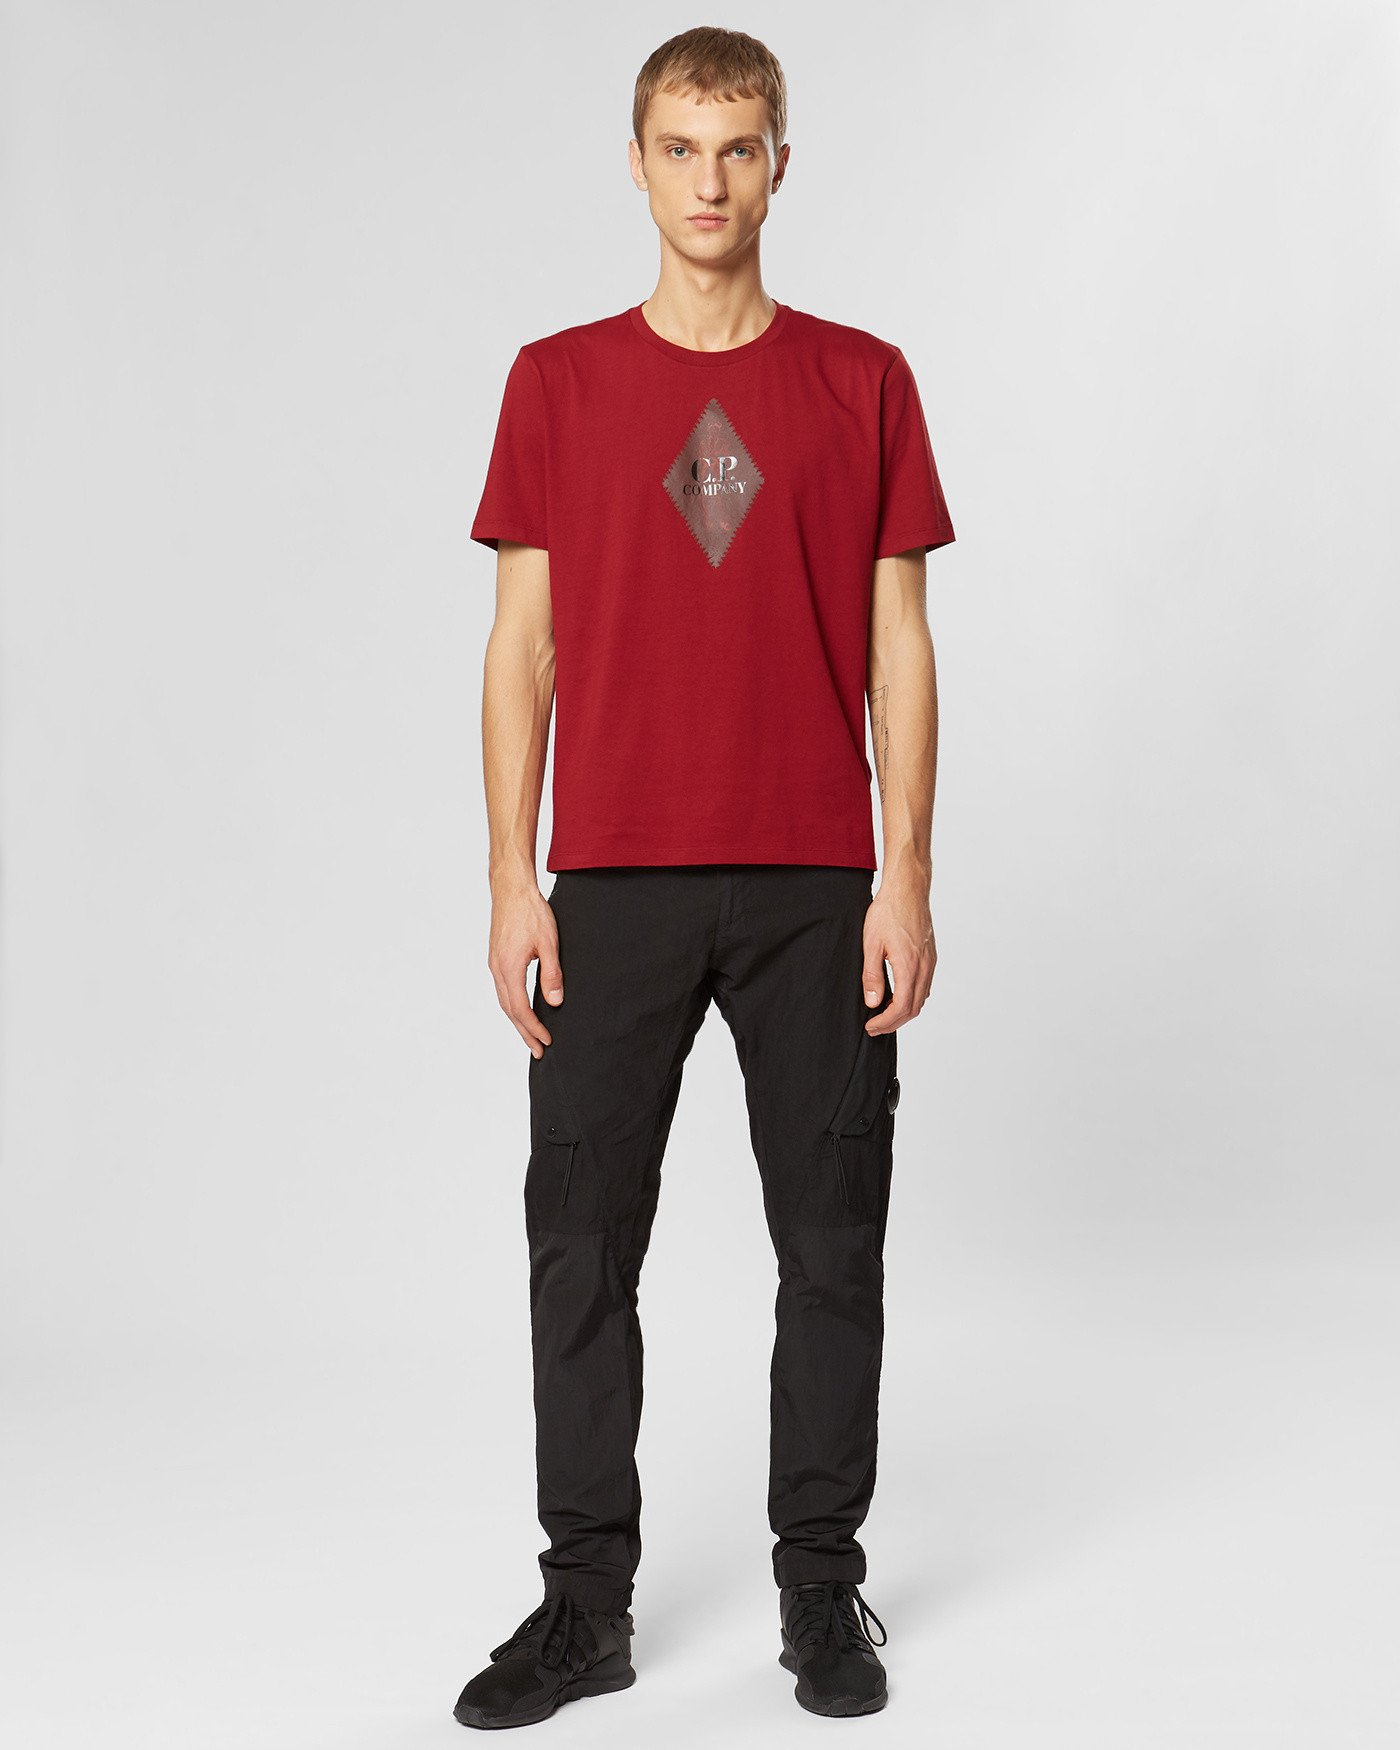 Jersey 30/1 Diamond Logo Print T-Shirt